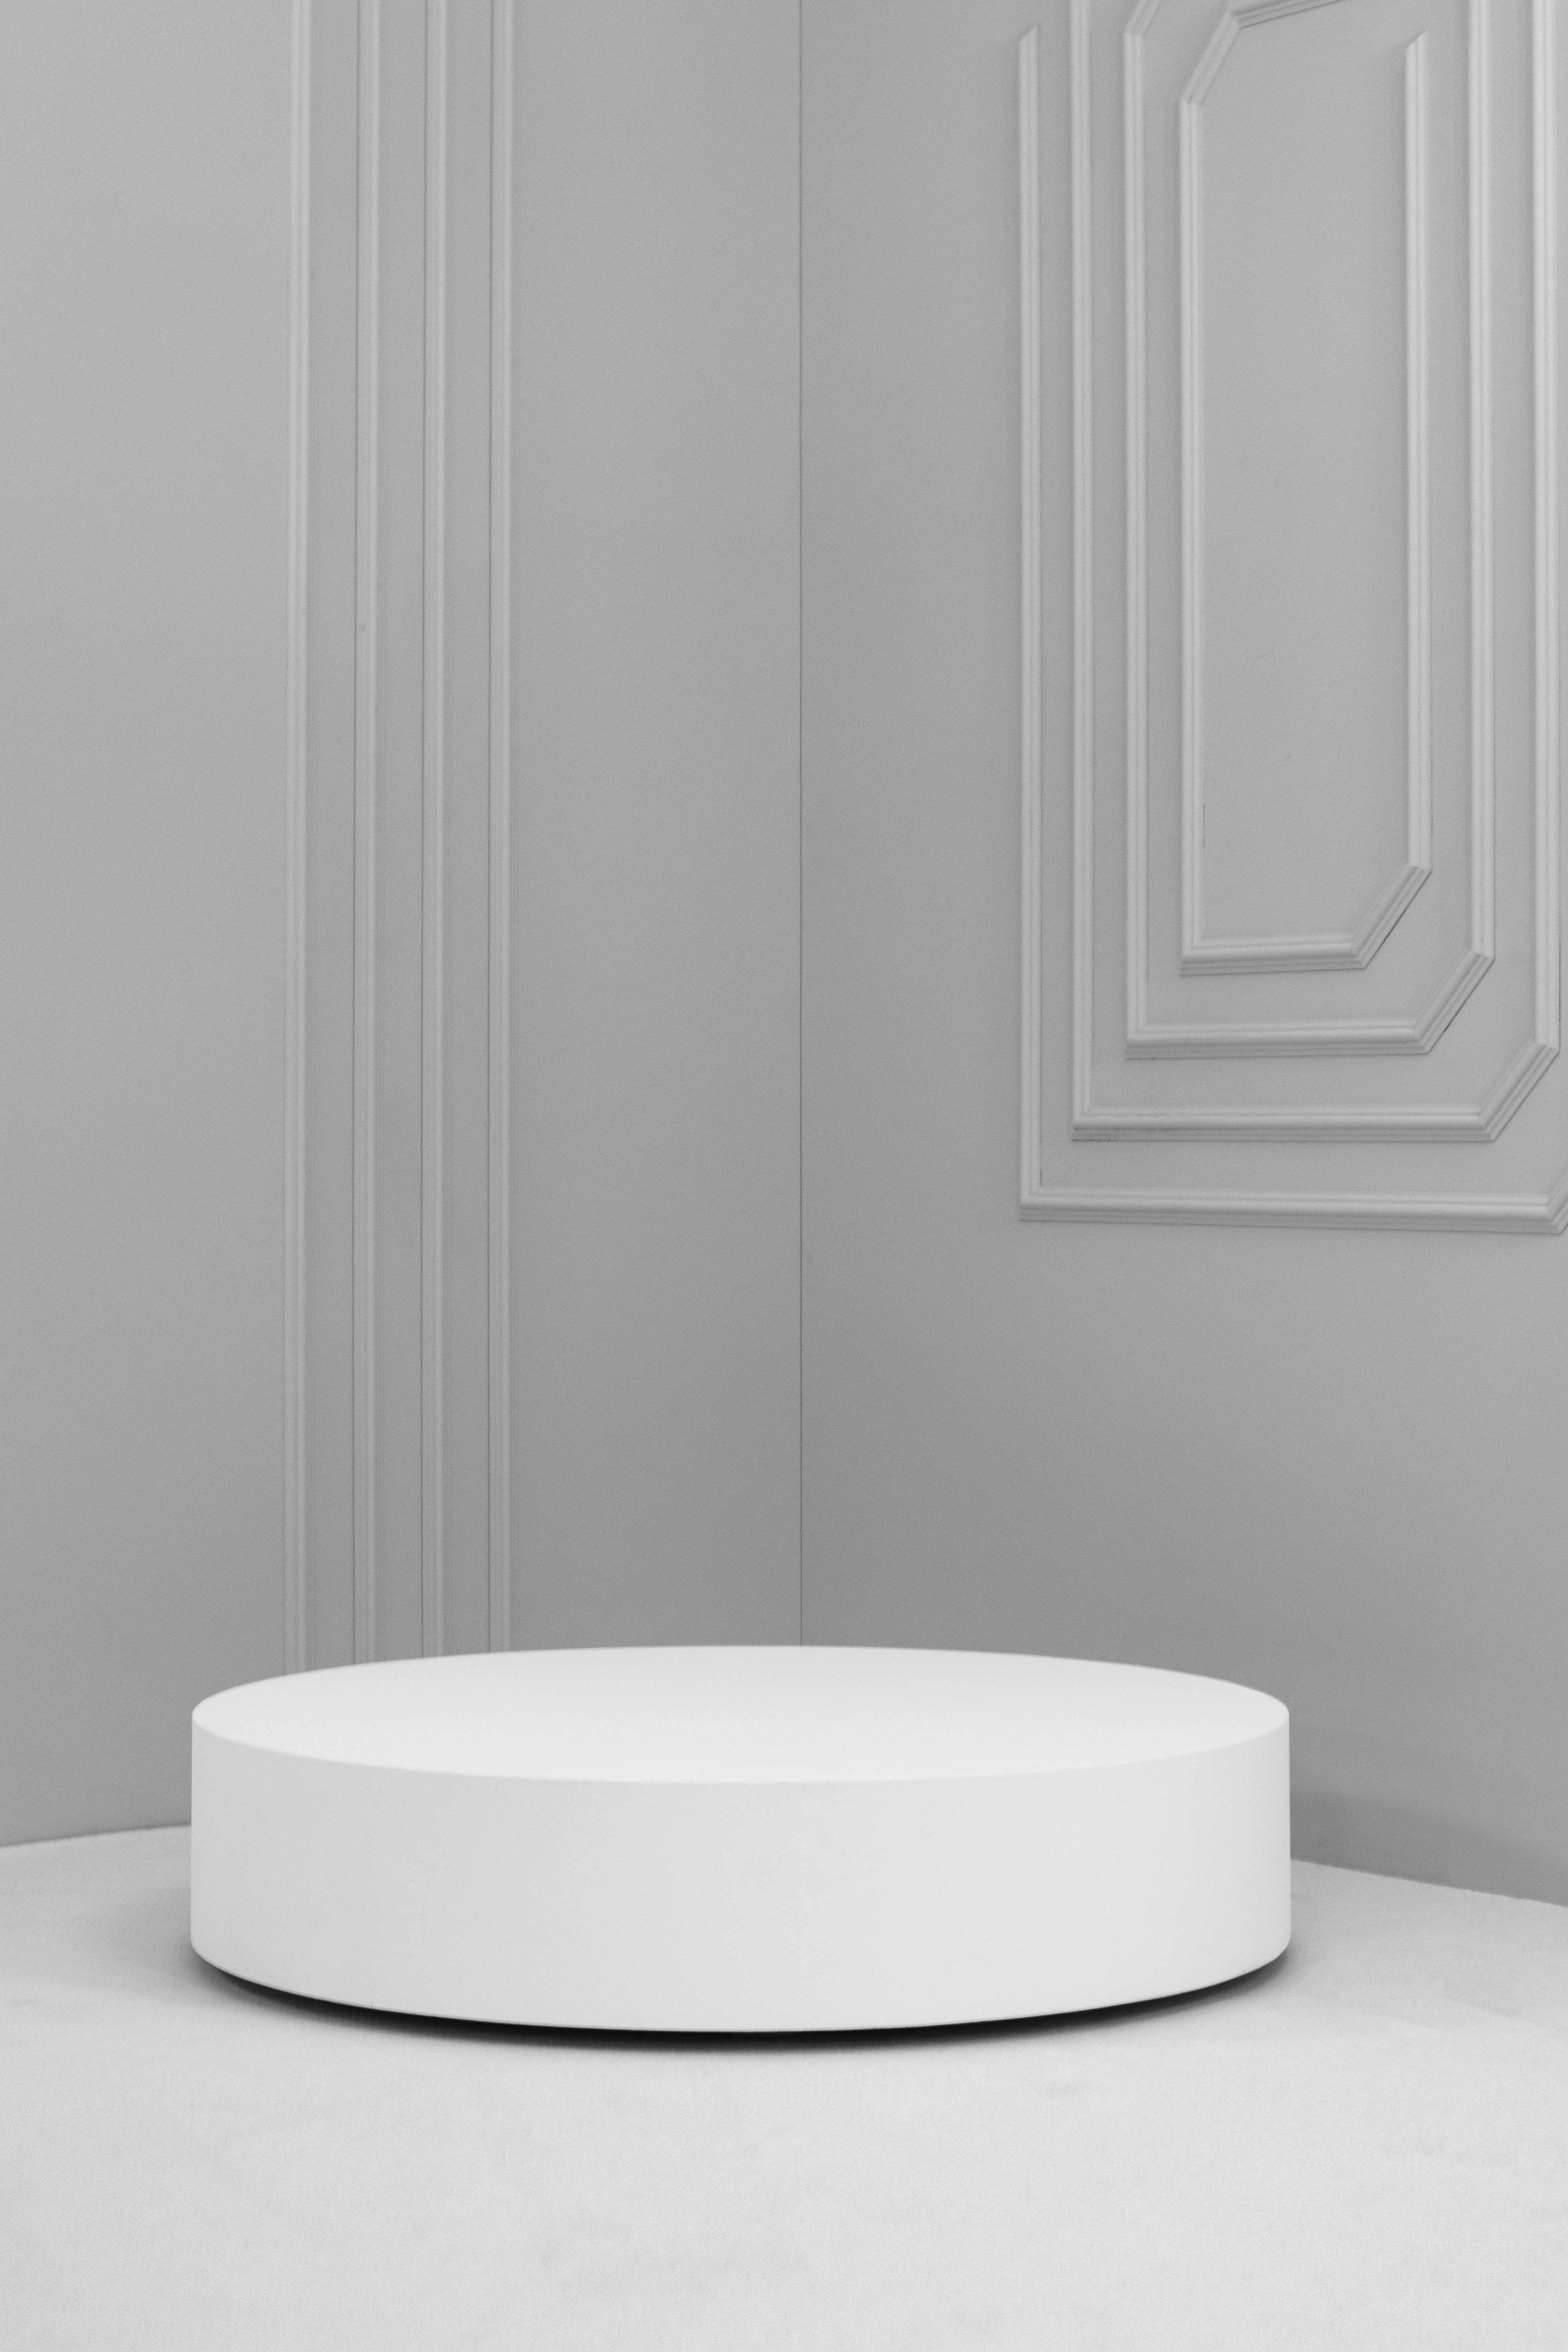 Low Round Plinths